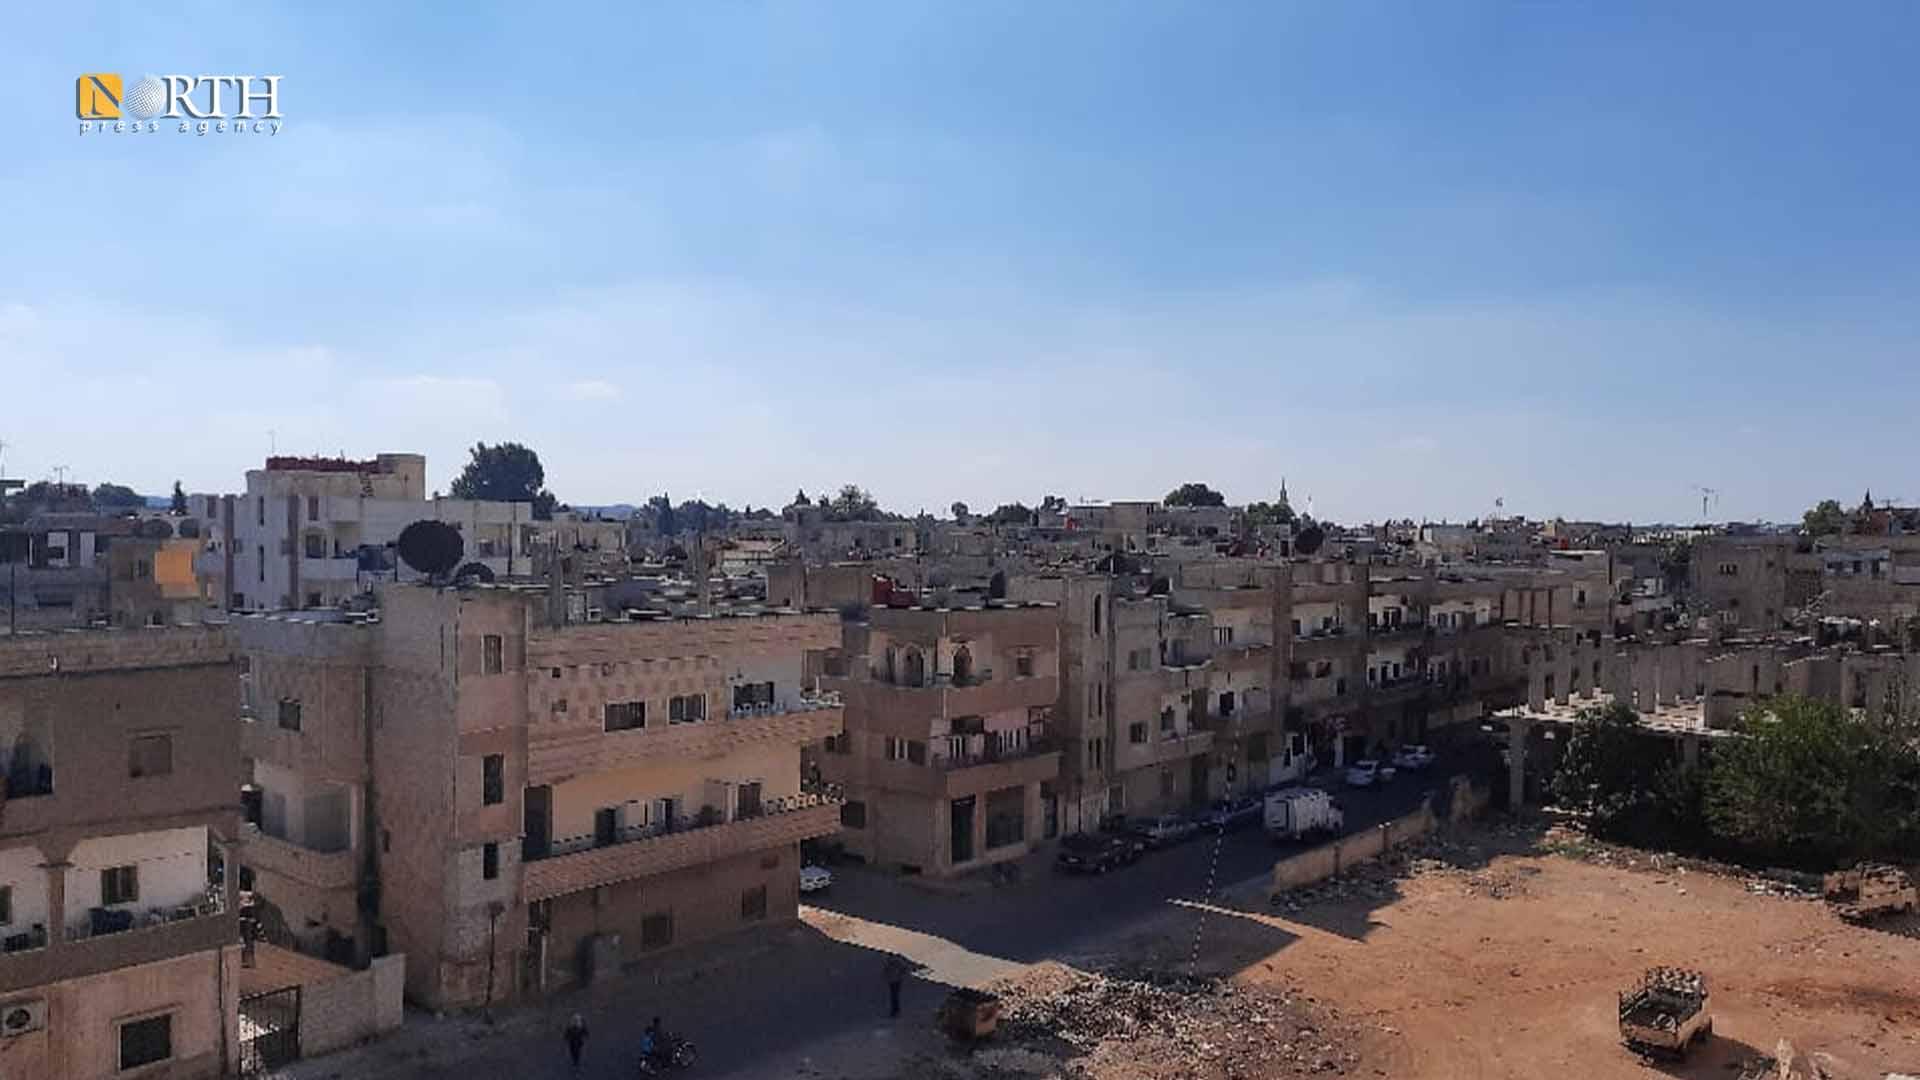 The city of Daraa al-Balad – North Press, archive